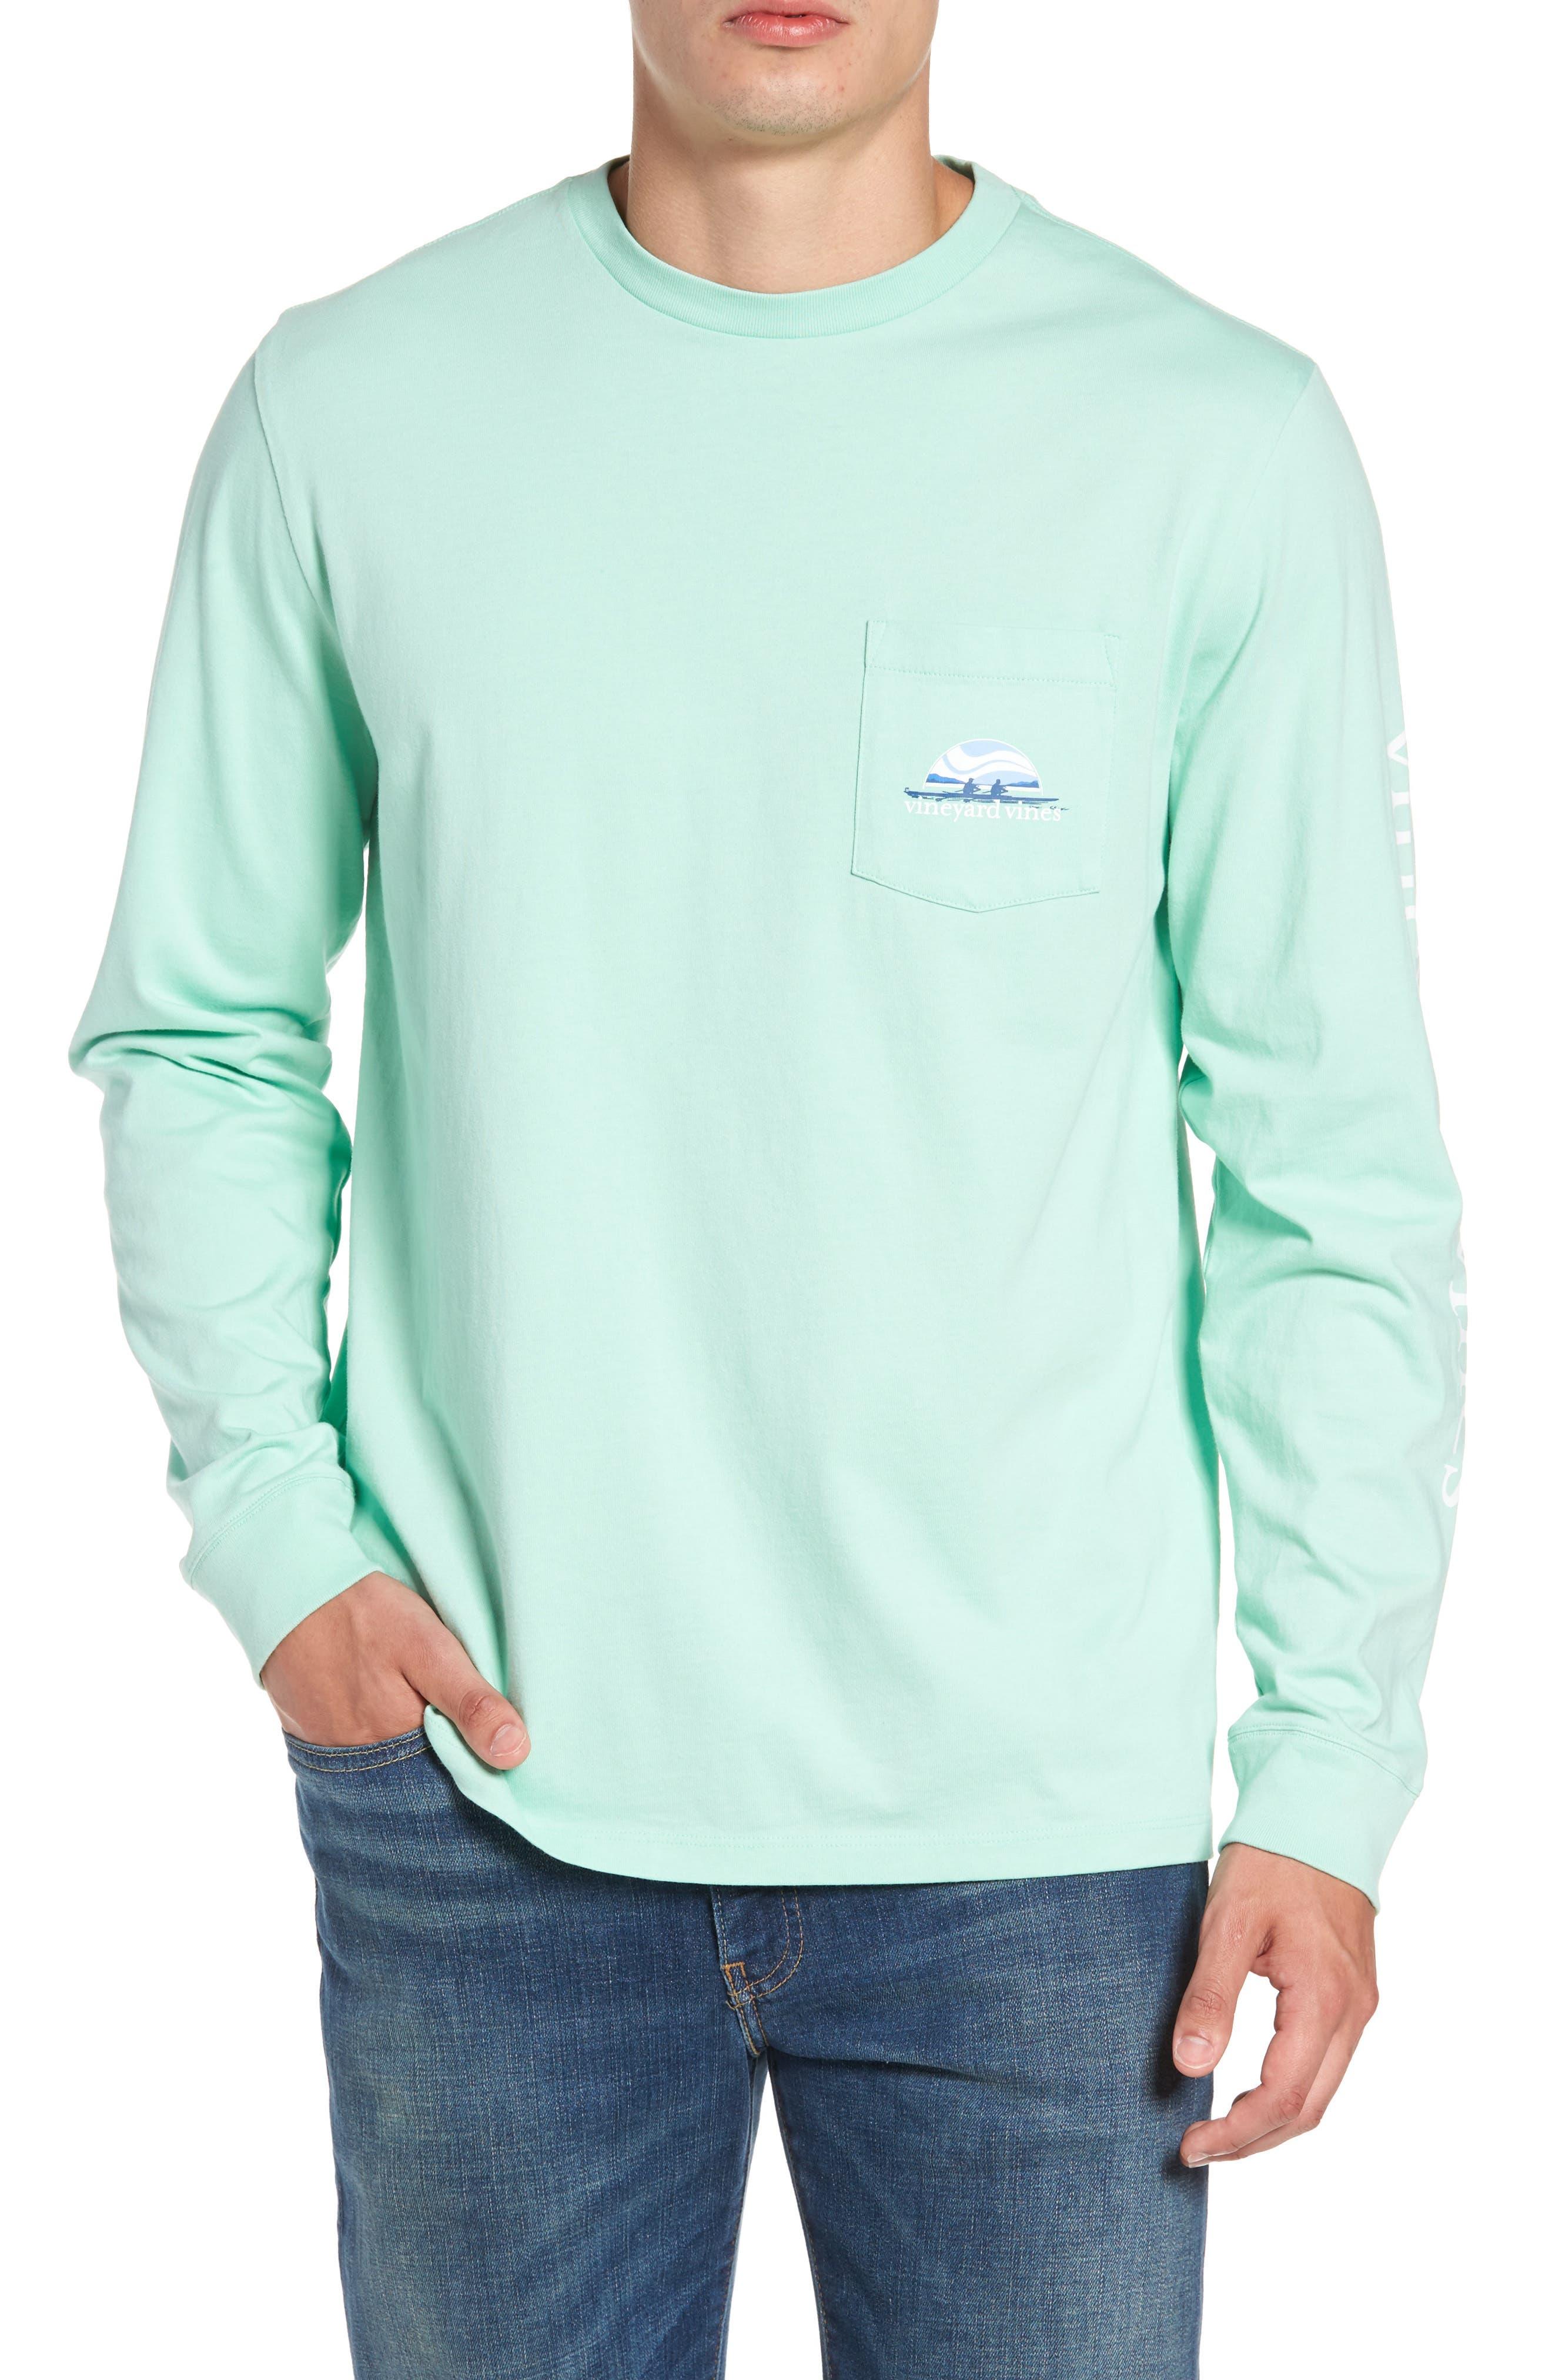 Rowing Graphic T-Shirt,                             Main thumbnail 1, color,                             343